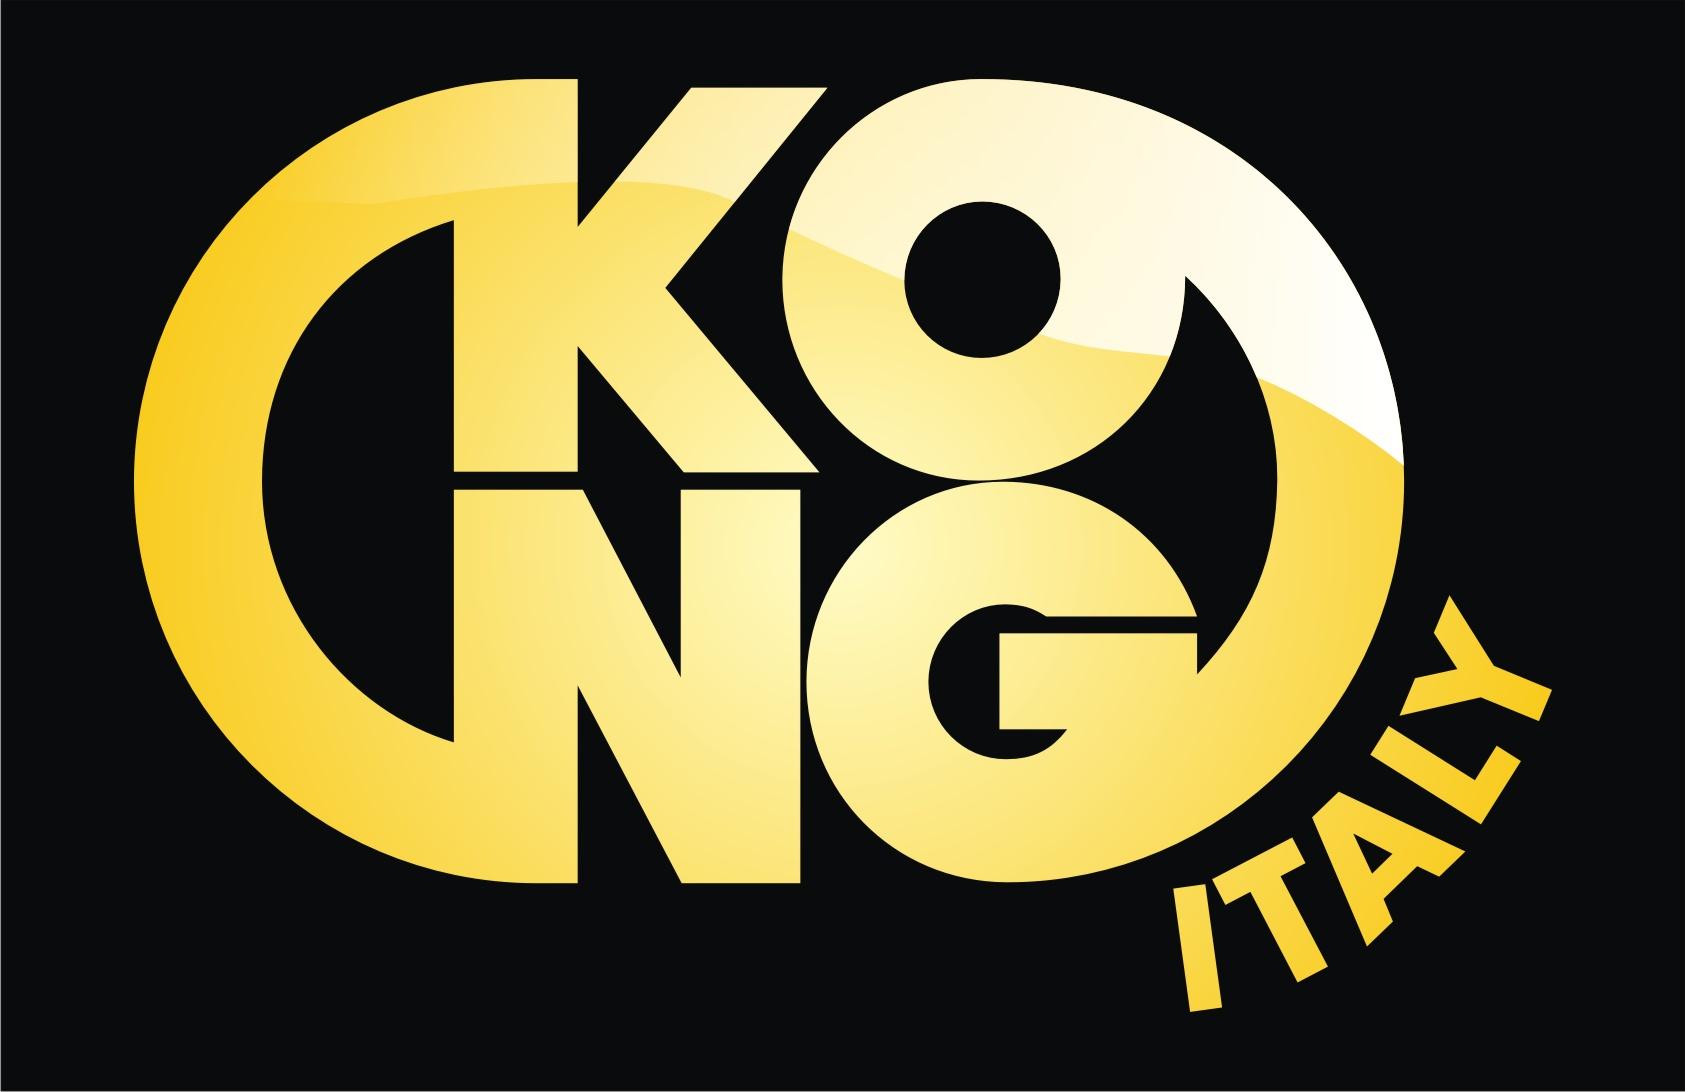 File:Logo KONG.jpg - Wikimedia Commons